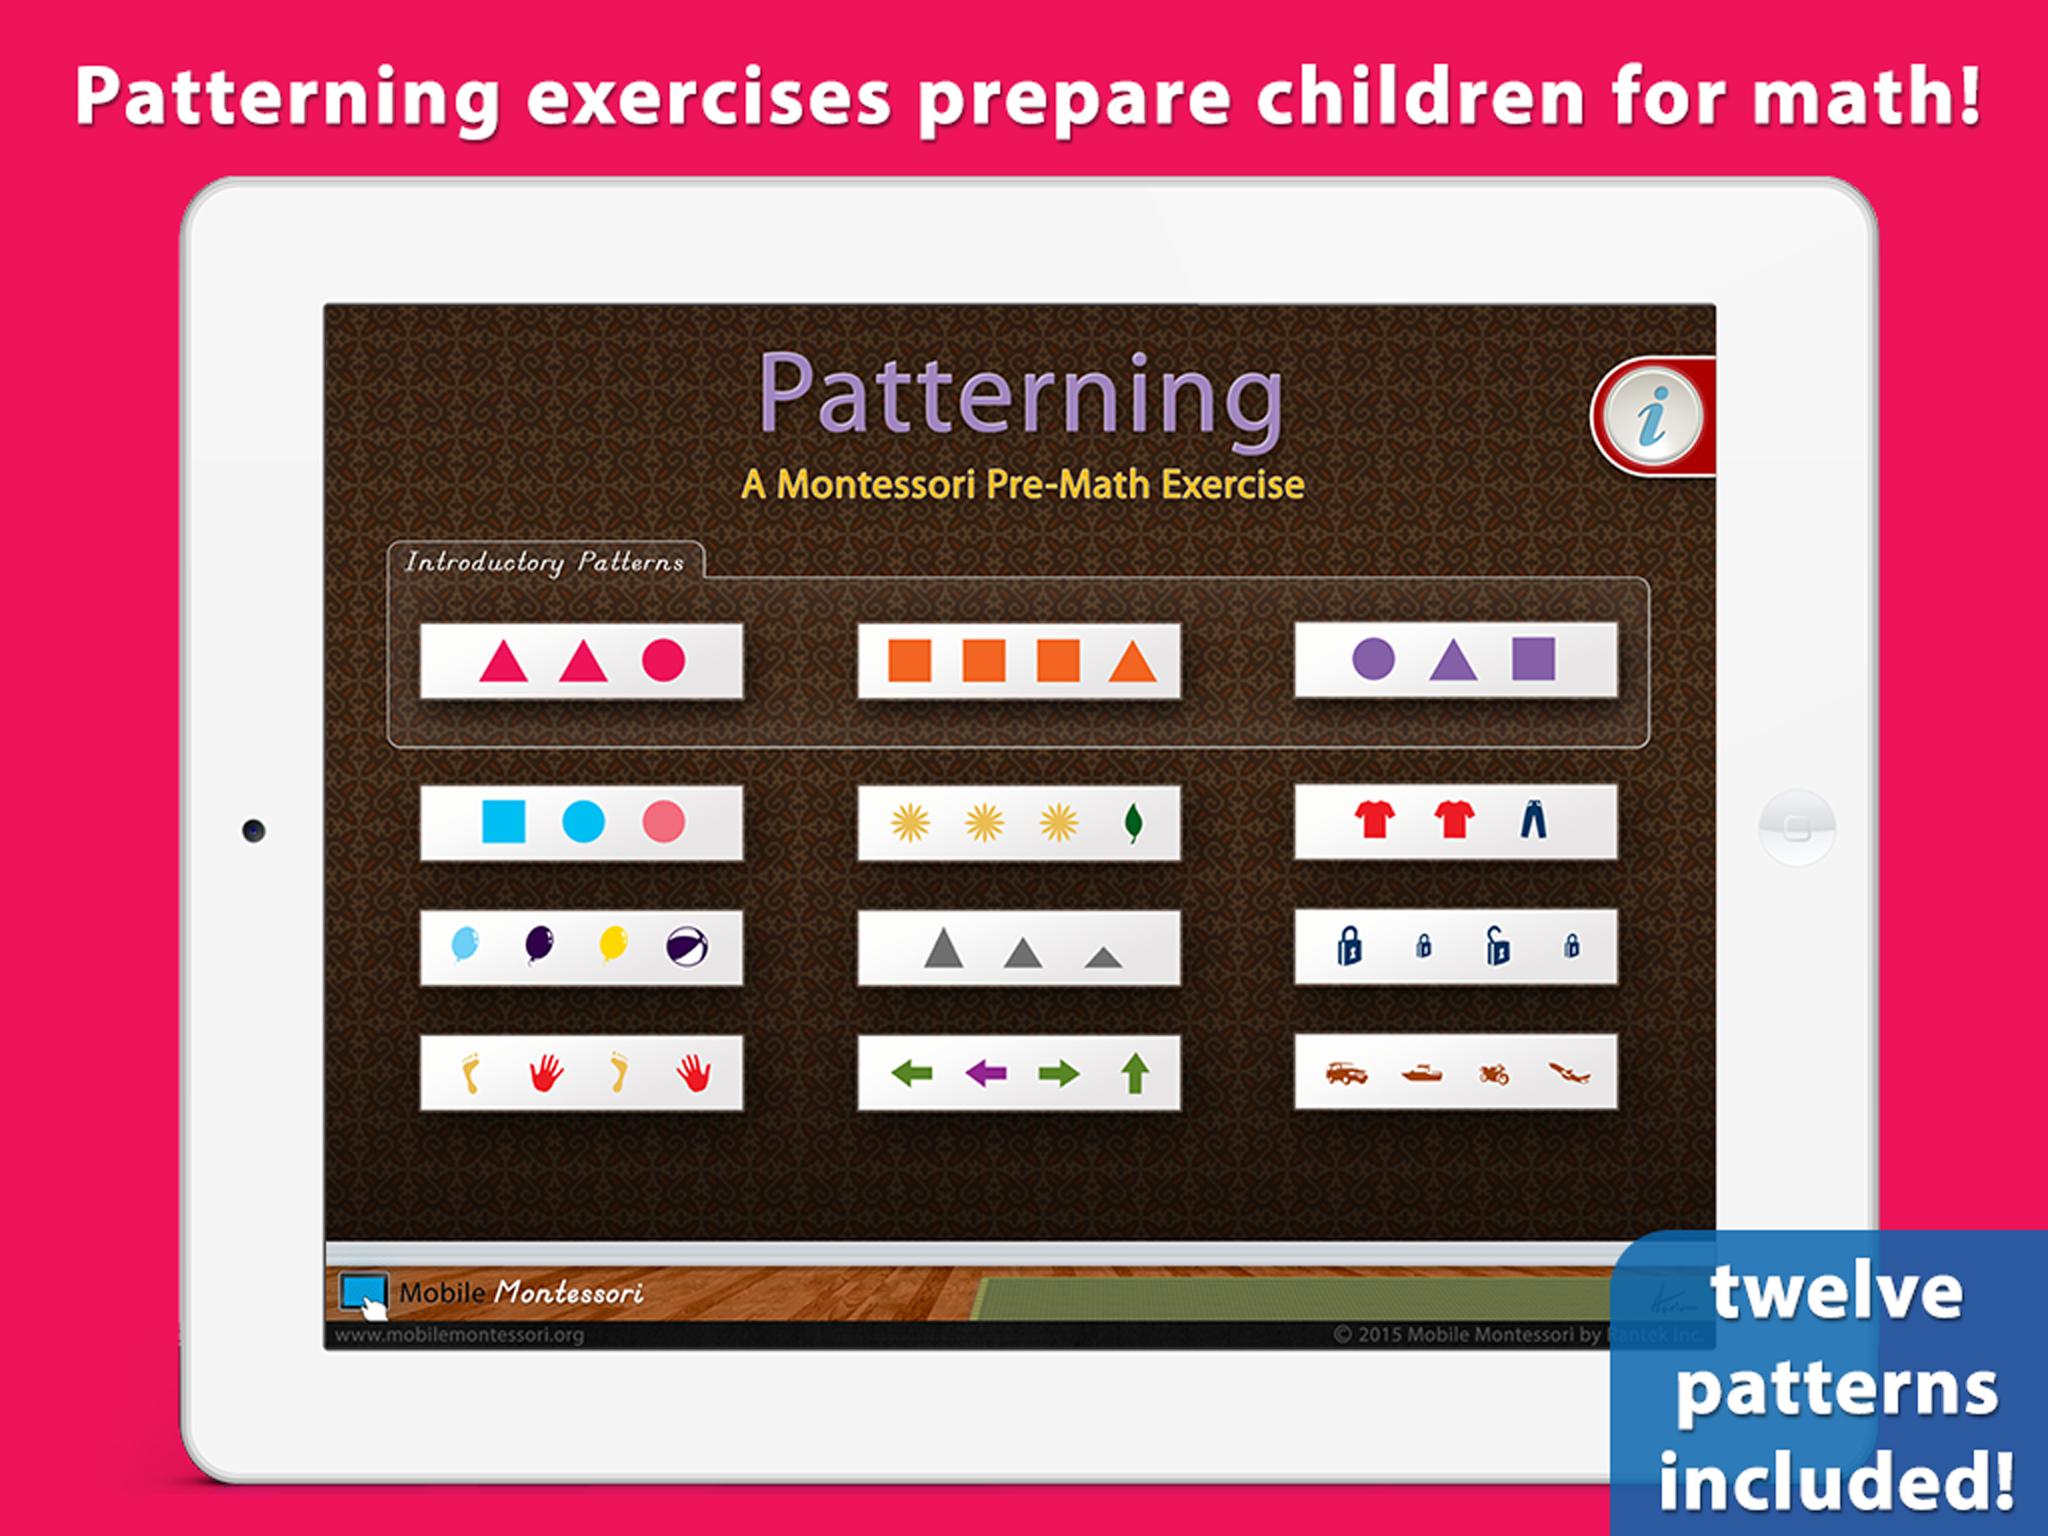 PatterningSC1-reg.png